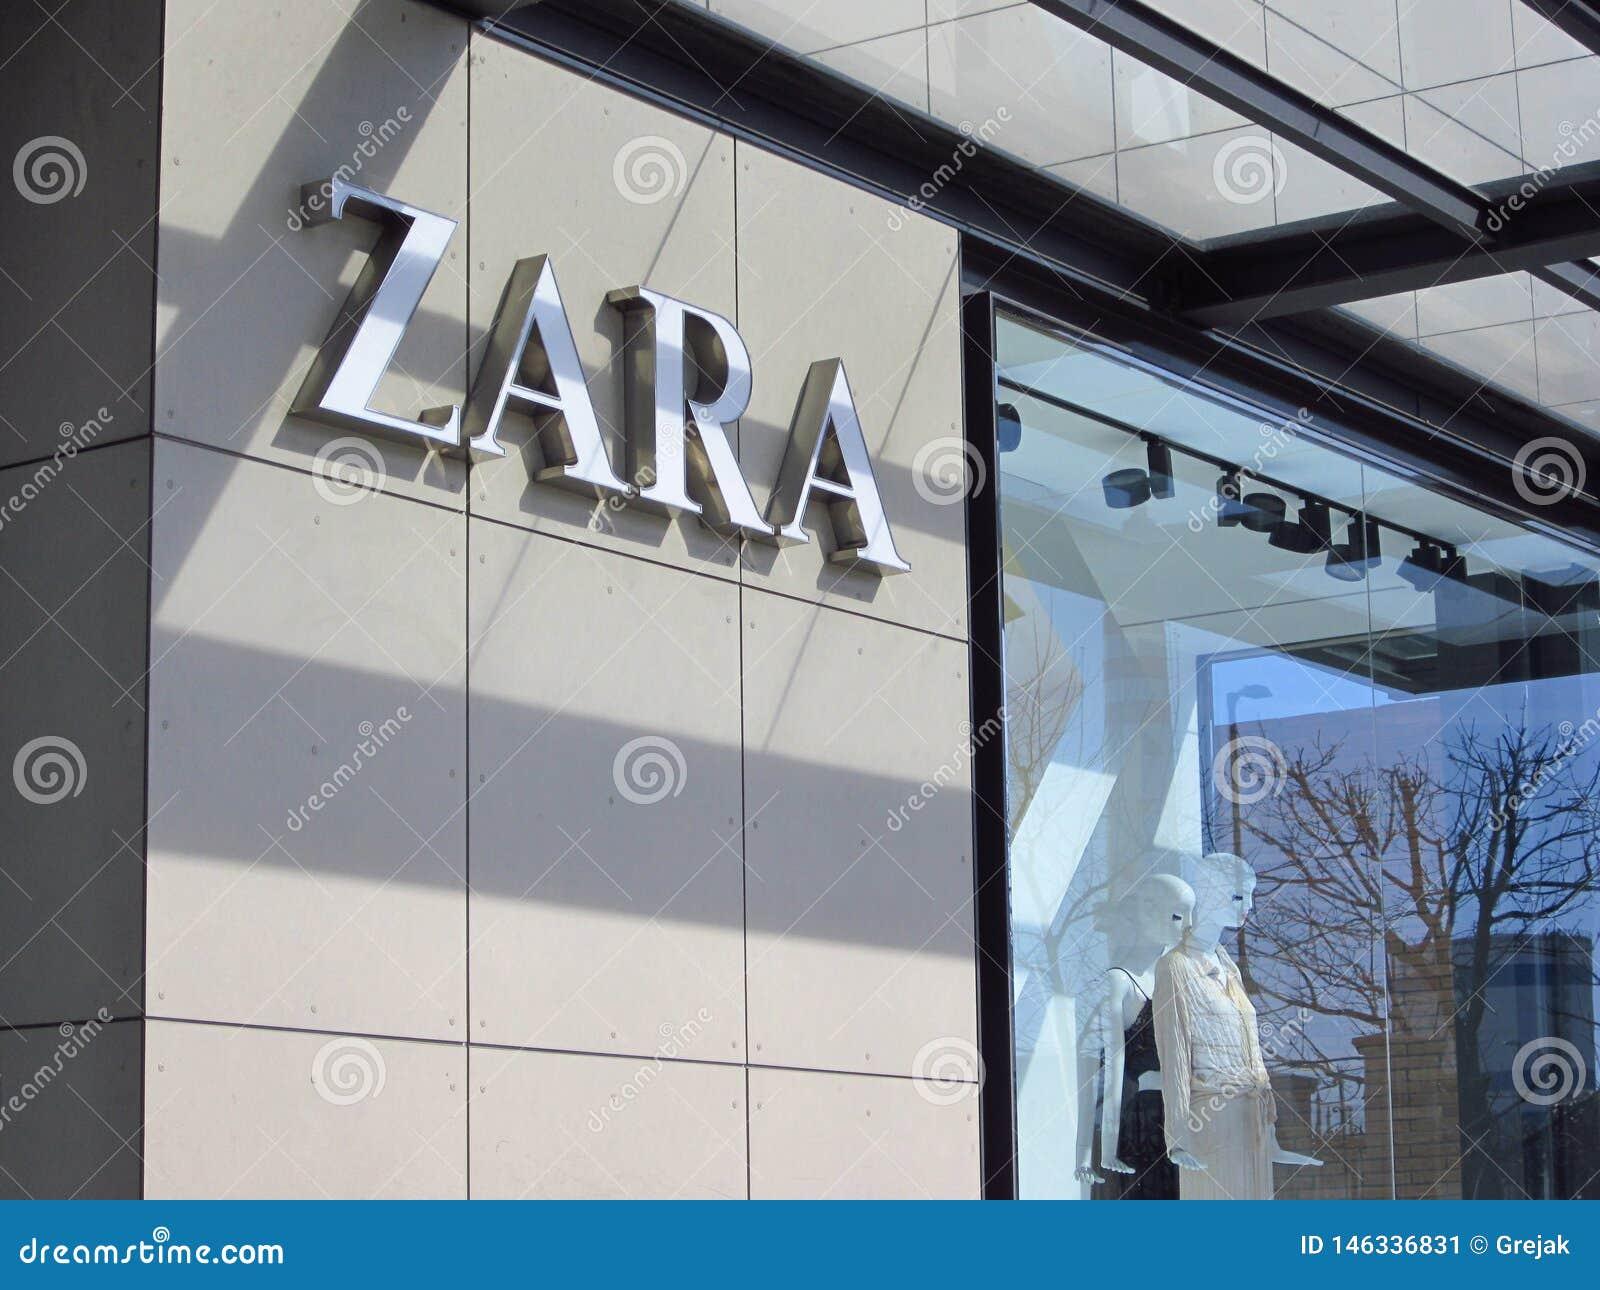 Zara store logo on a building